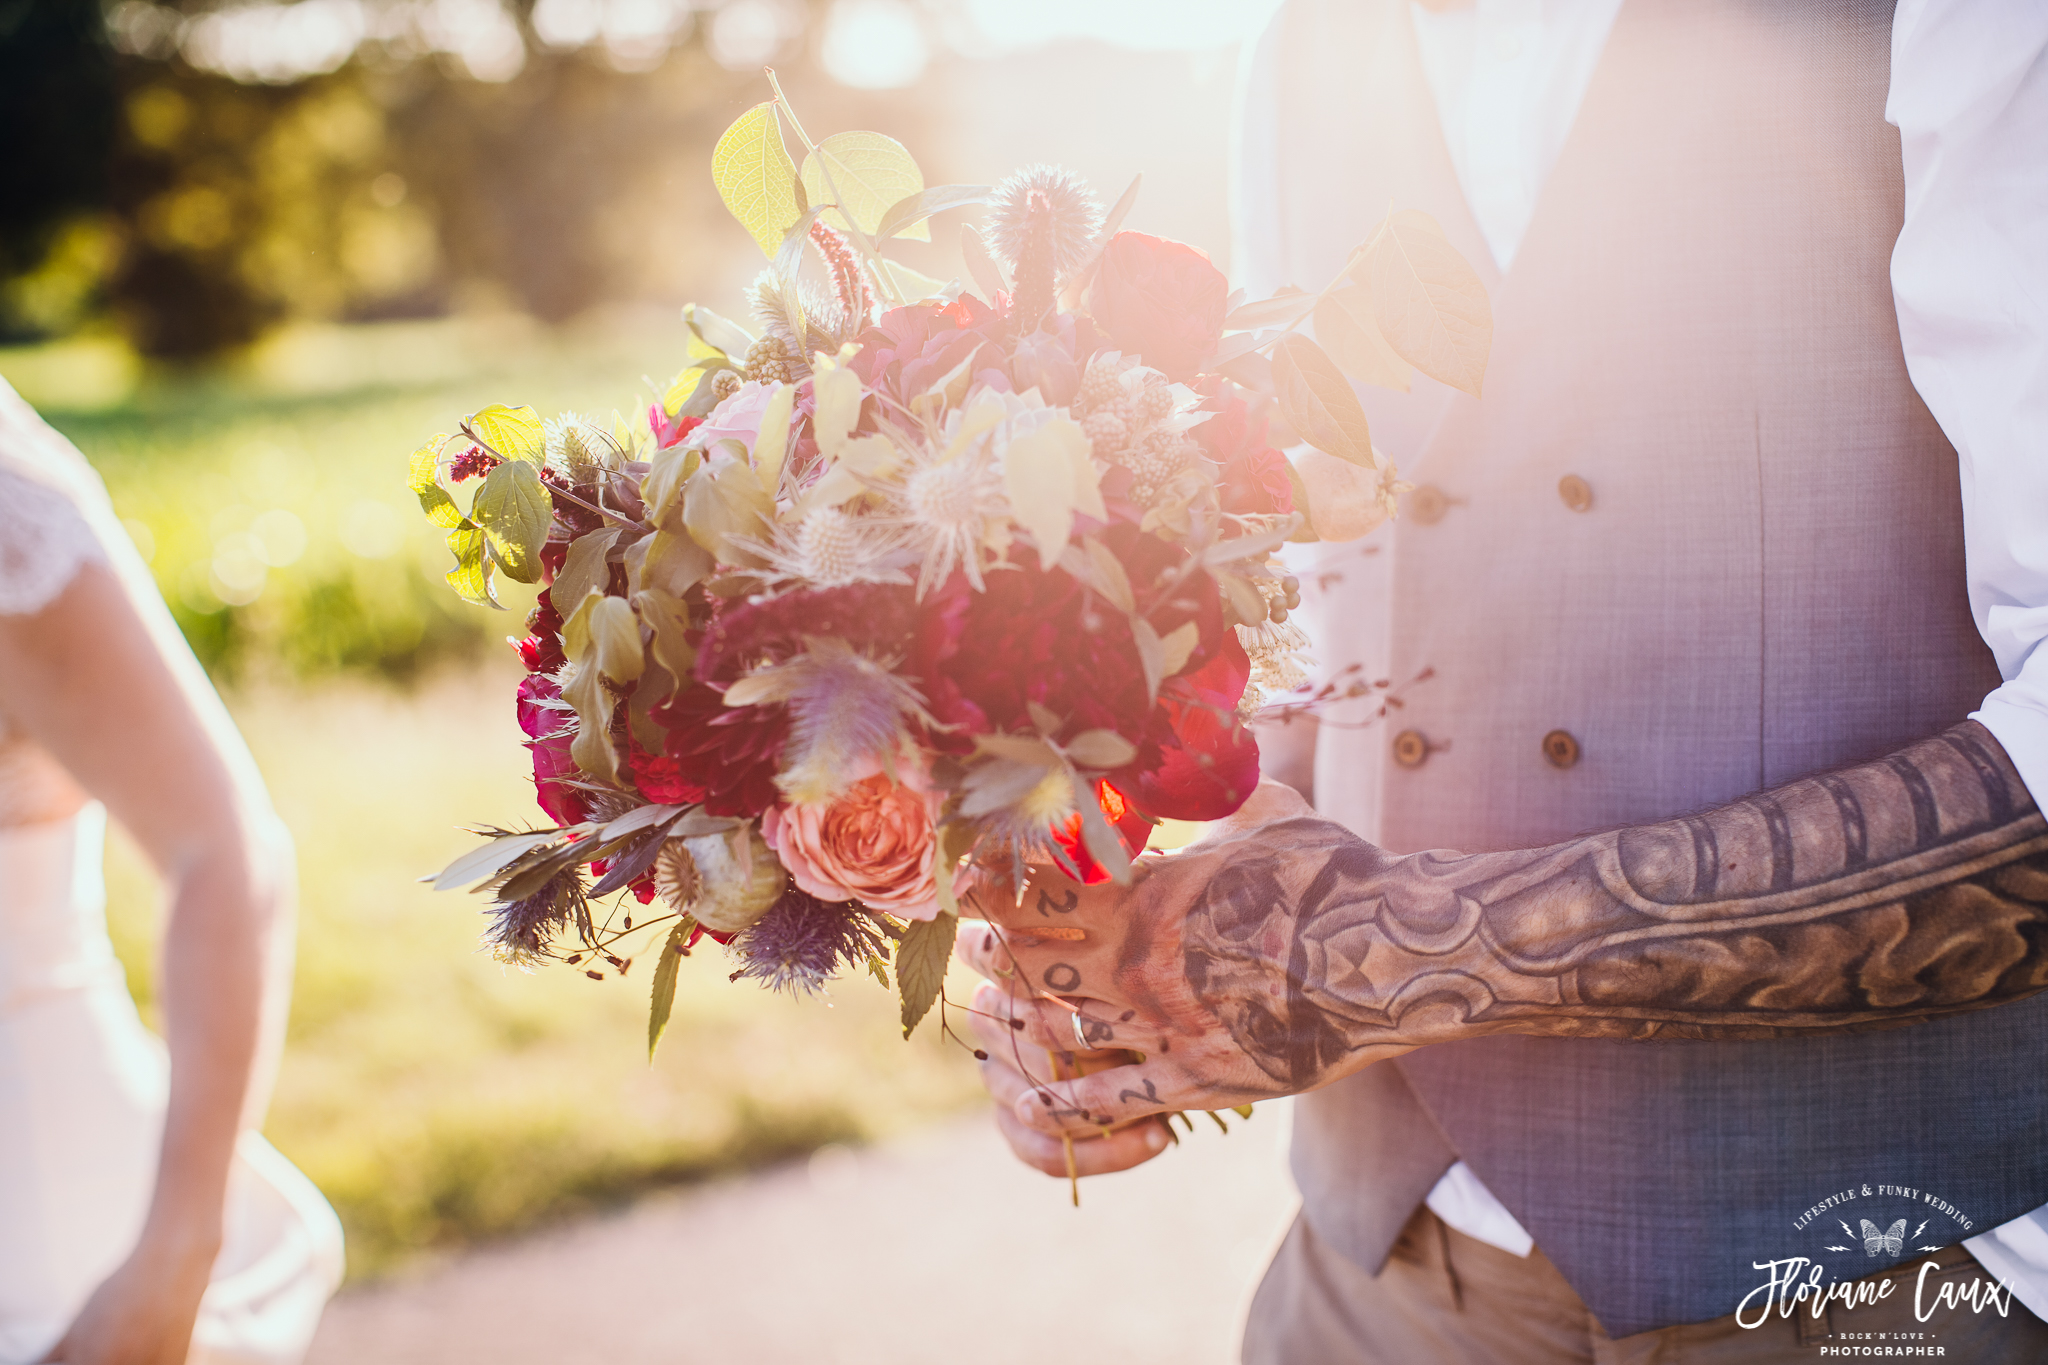 photographe-mariage-toulouse-rocknroll-maries-tatoues-floriane-caux-62